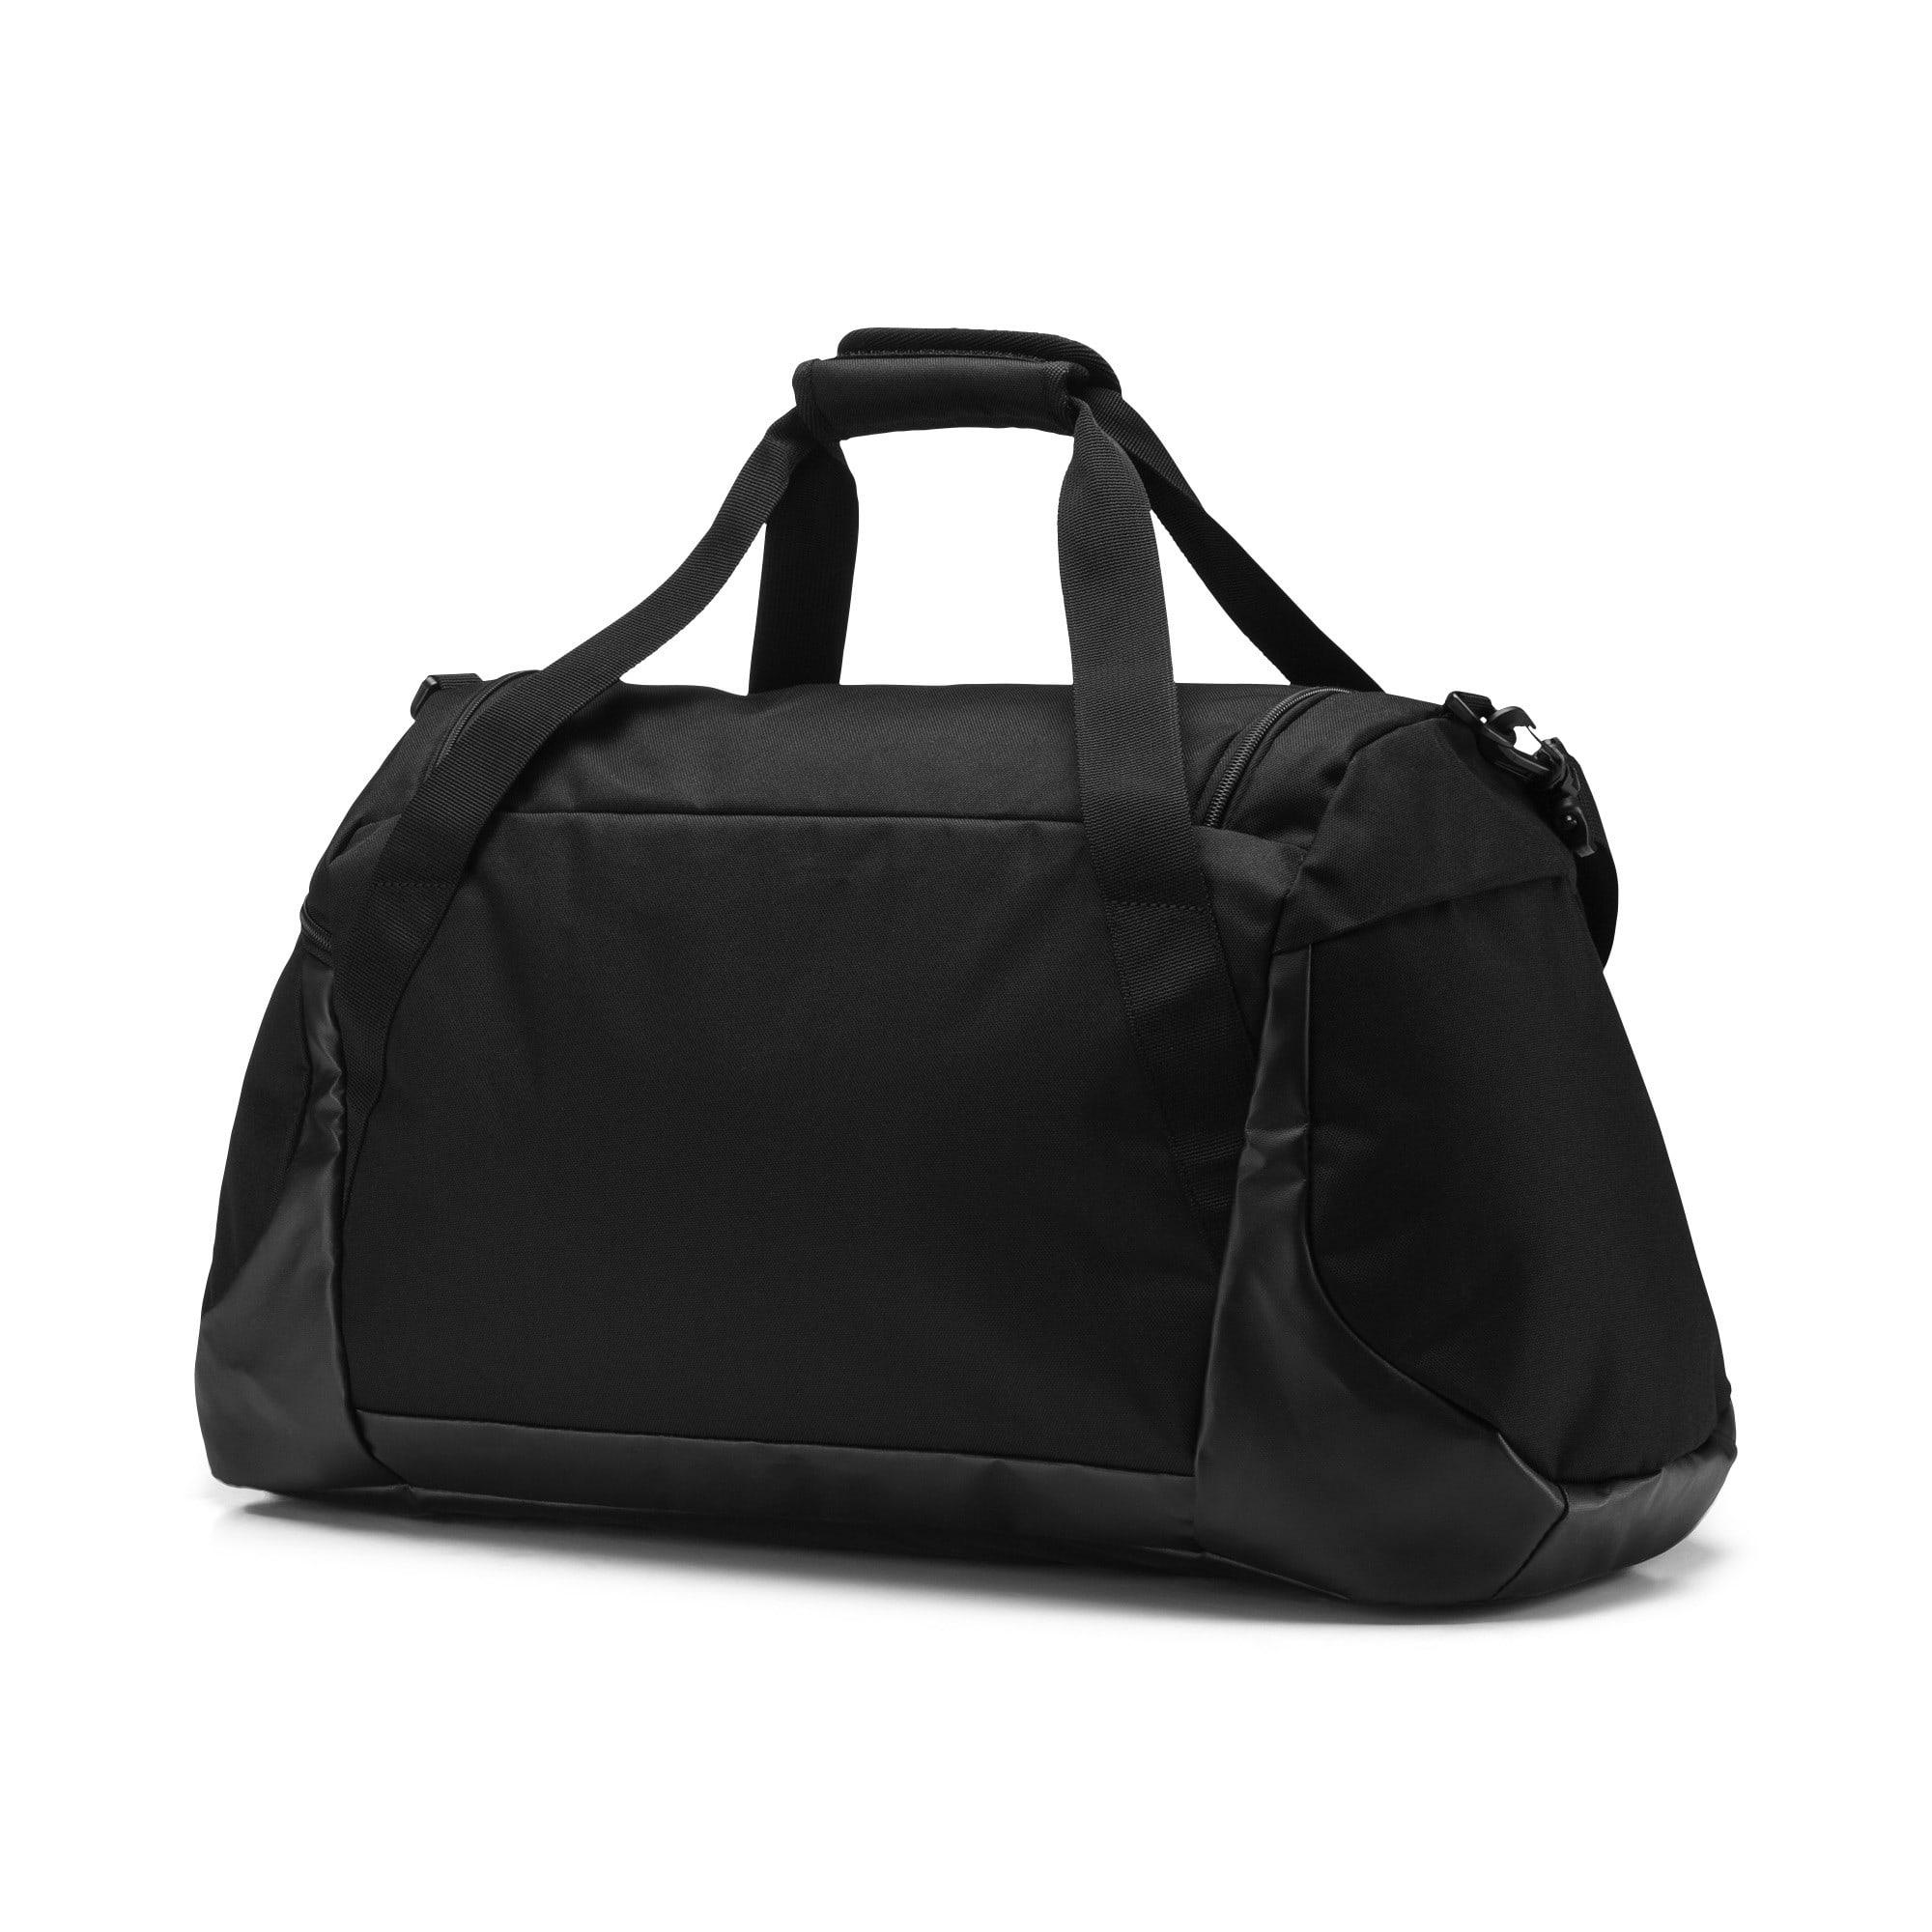 Thumbnail 3 of GYM Duffel Bag, Puma Black, medium